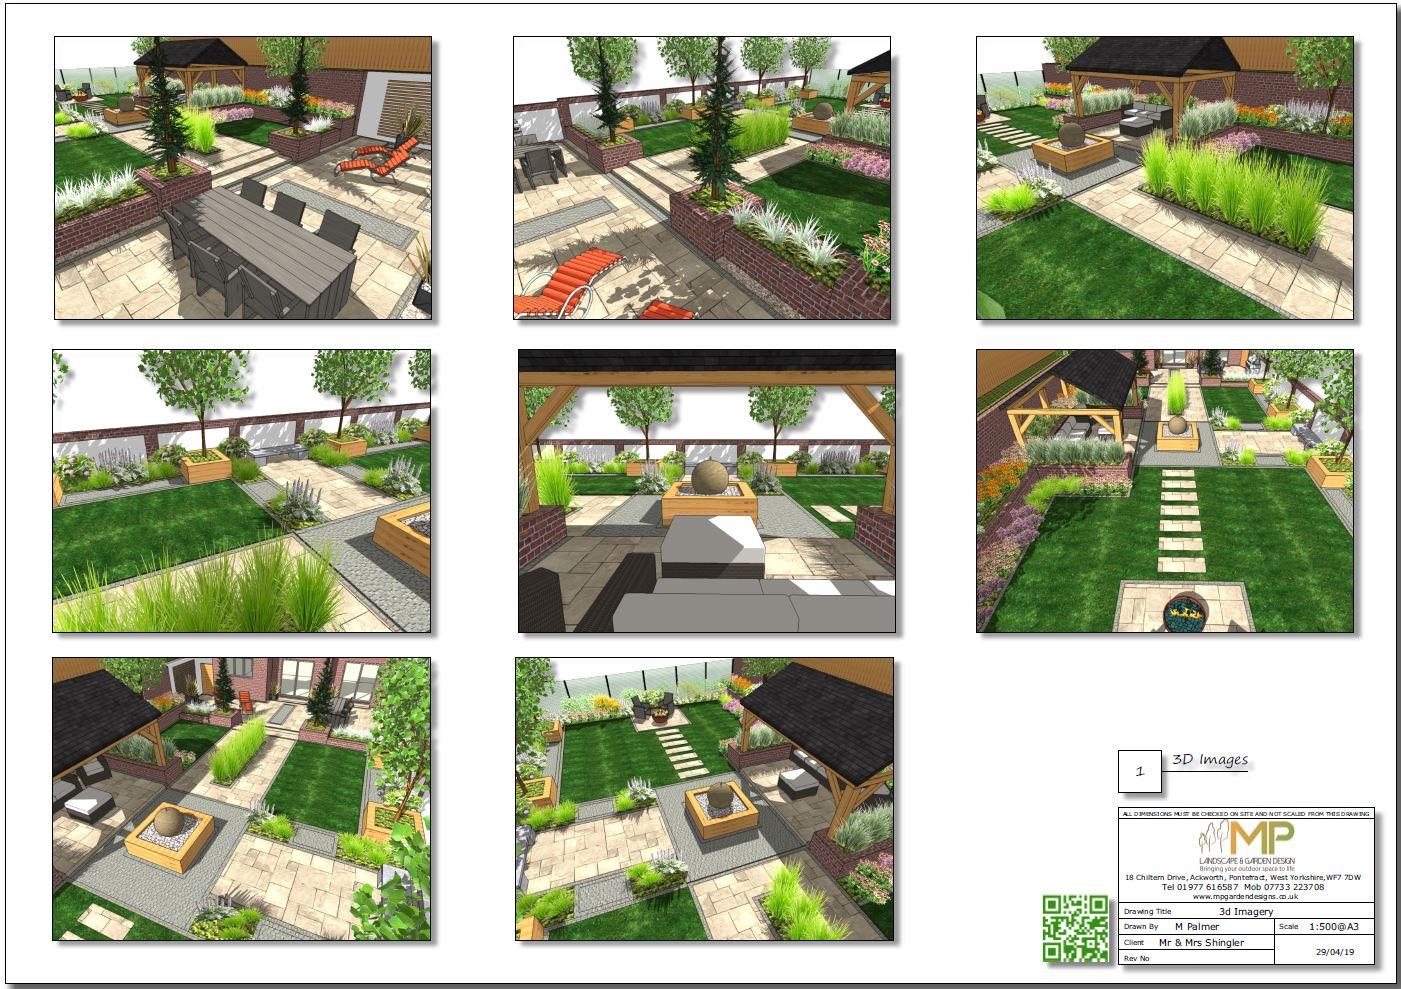 2 Garden layout plan 3D images, Wakefield